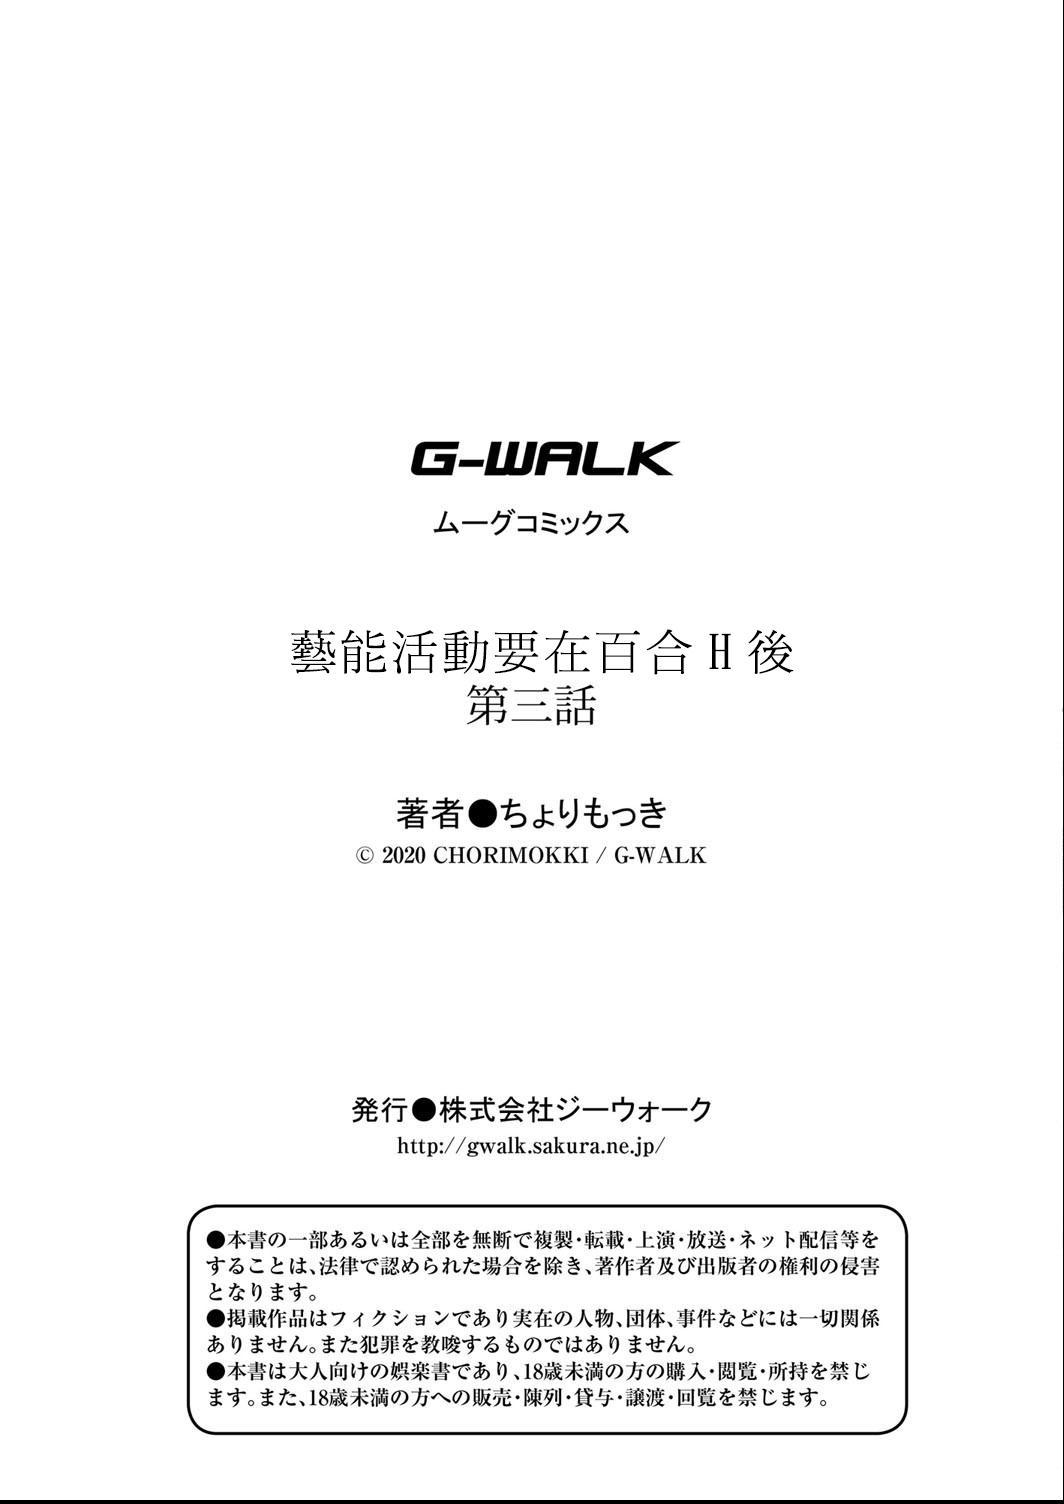 [Cyori Mokki] Geinou  Katsudou wa Yuri Ecchi no atode ch.1-3 丨藝能活動要在百合H後 第1-2話  [Chinese] [沒有漢化] [Digital] 76